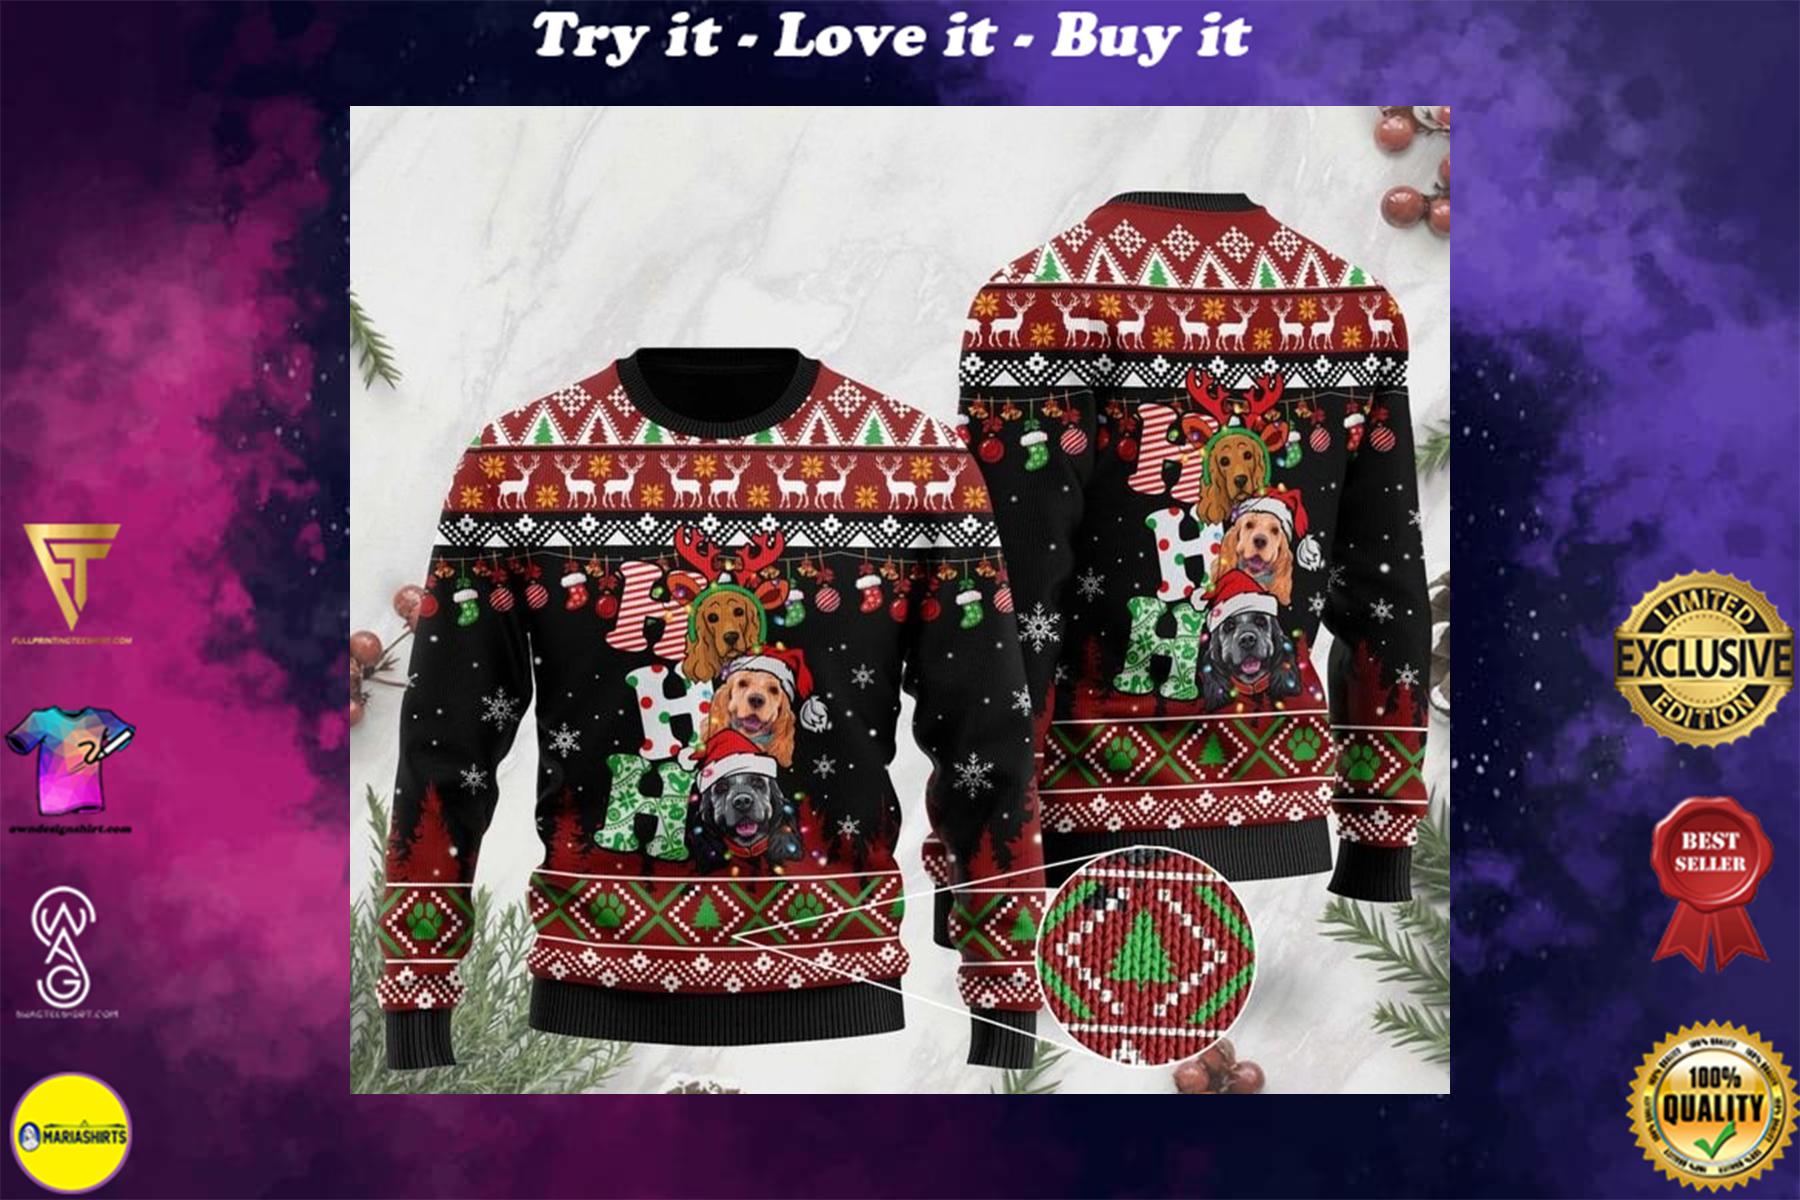 [highest selling] dog lover cocker spaniel ho ho ho christmas ugly sweater - maria